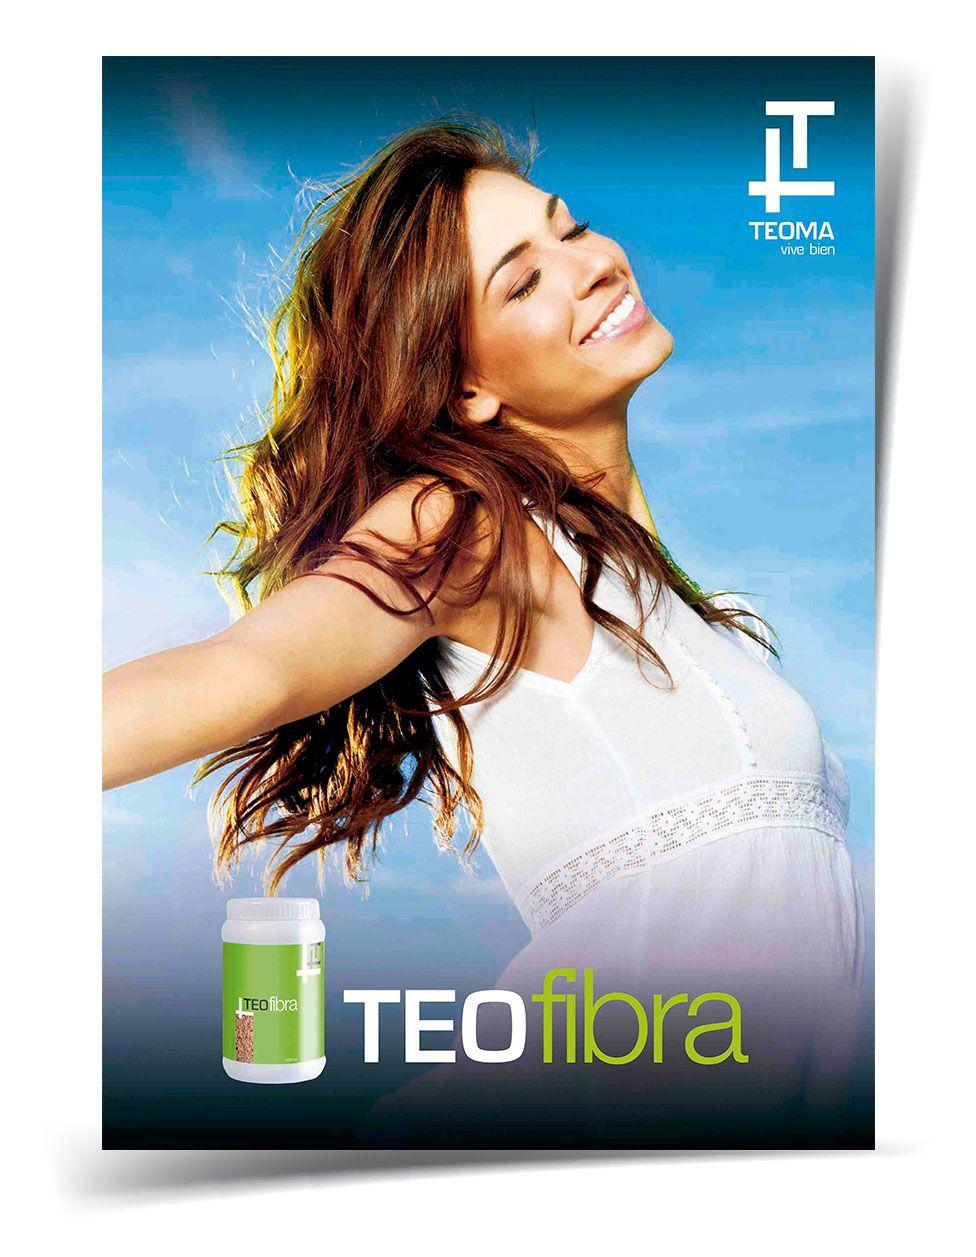 TeoFibra by Teoma